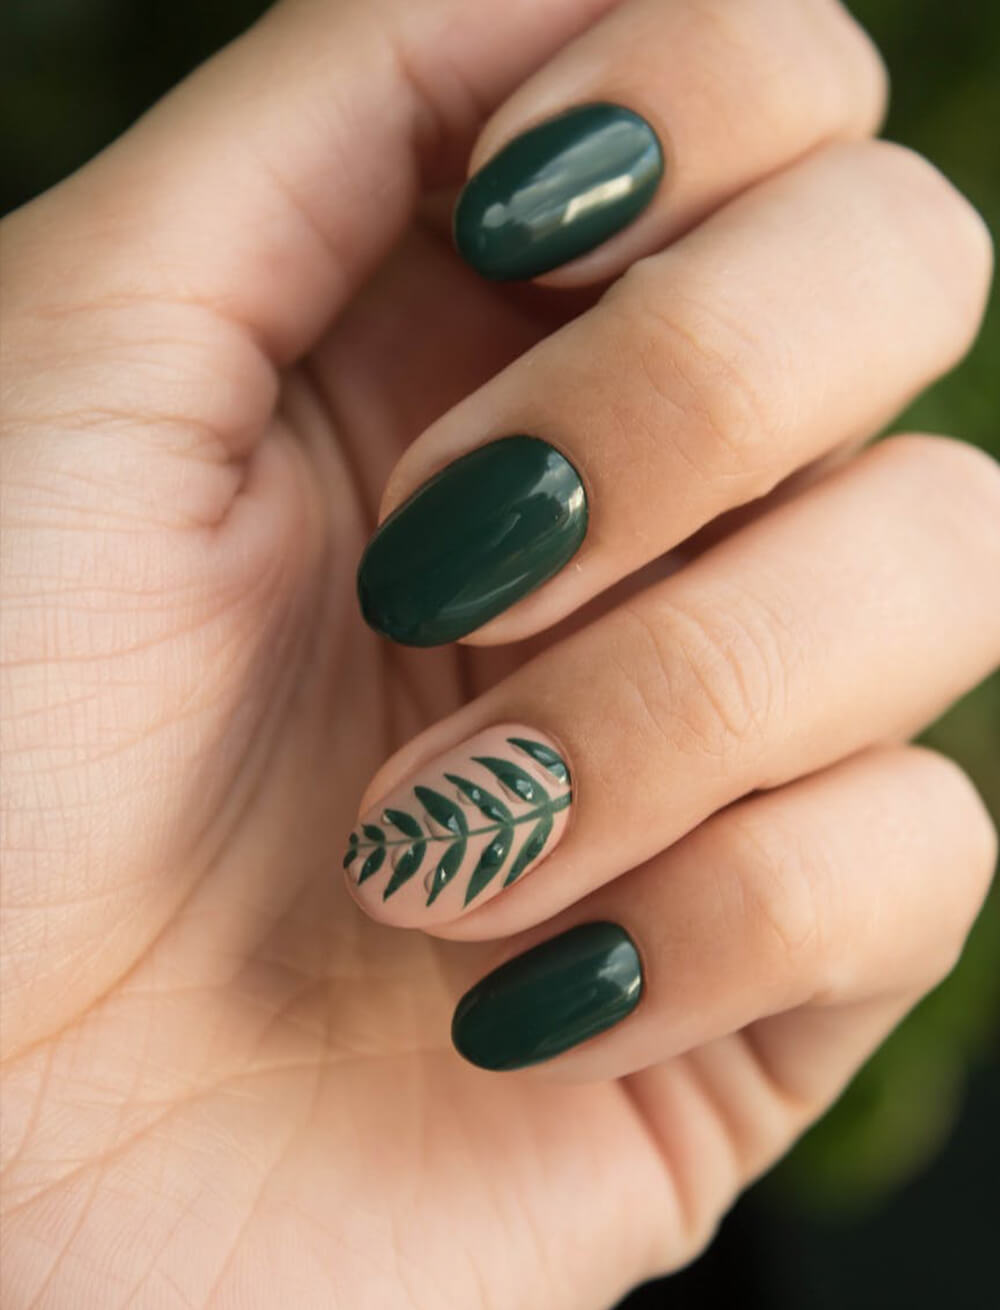 Nails Care - 3,2,1 Beauty